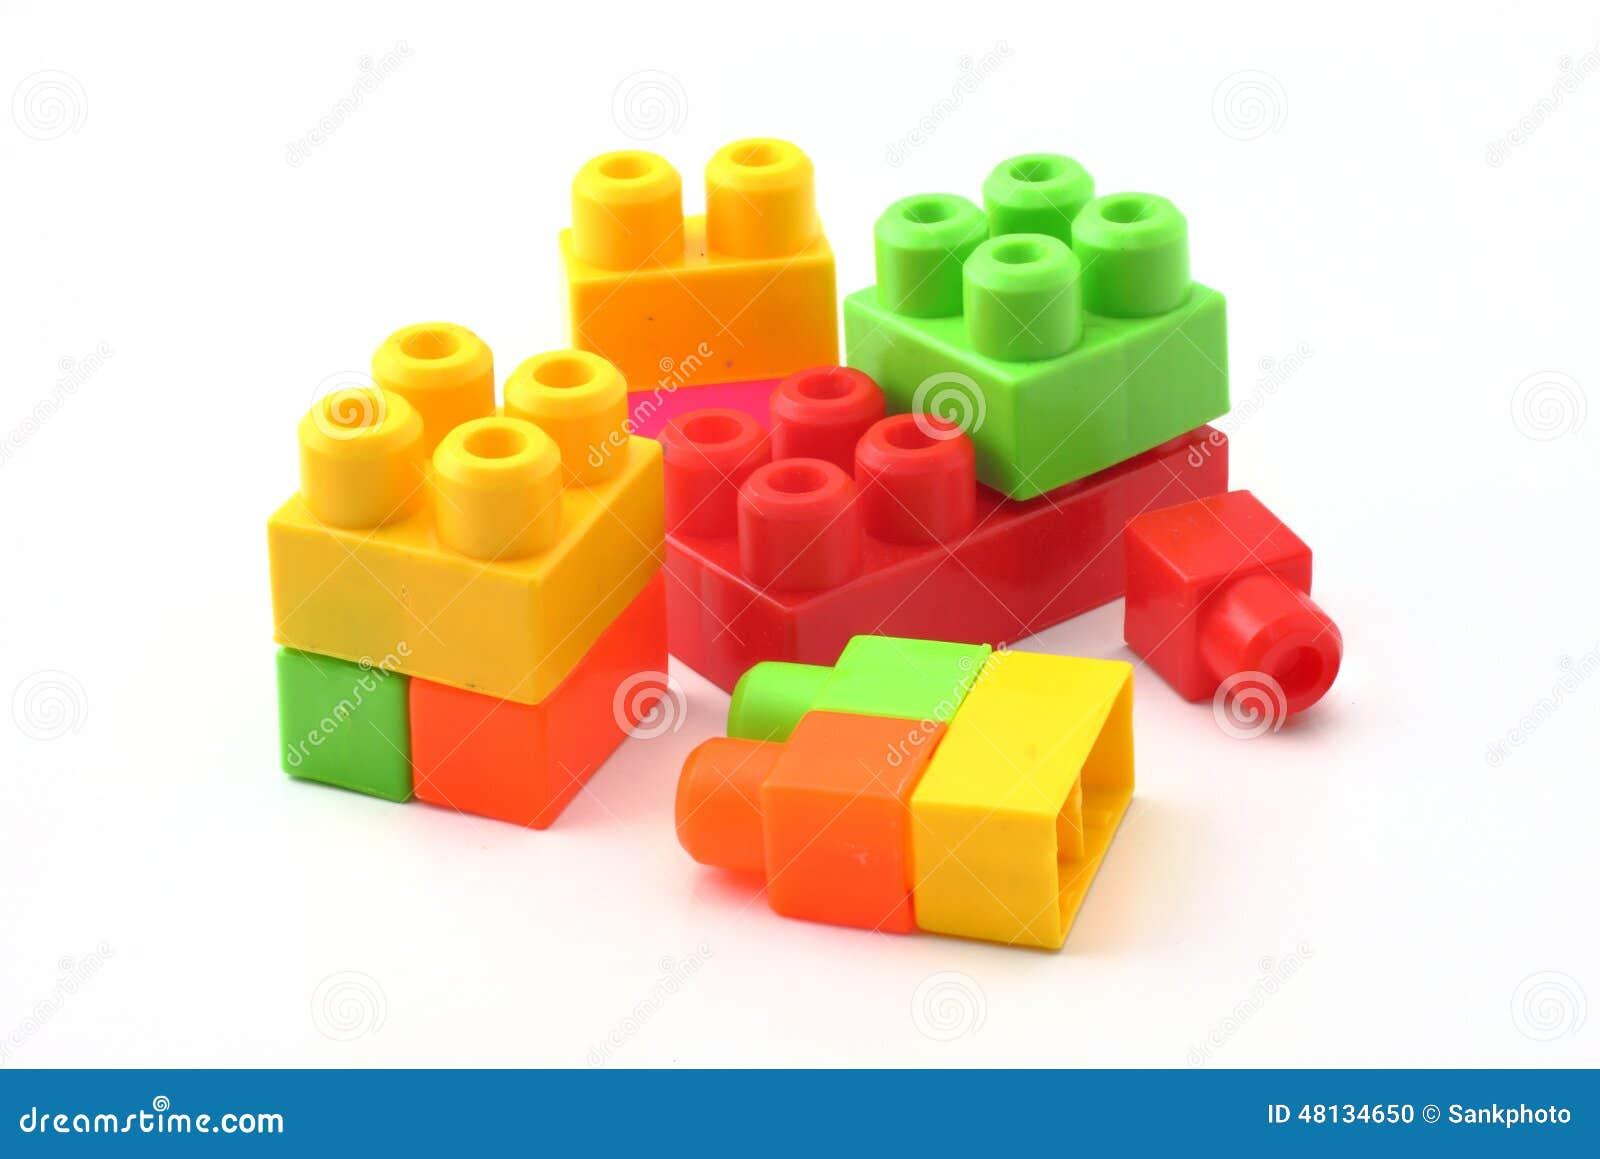 Plastic Building Blocks Stock Photo Image 48134650